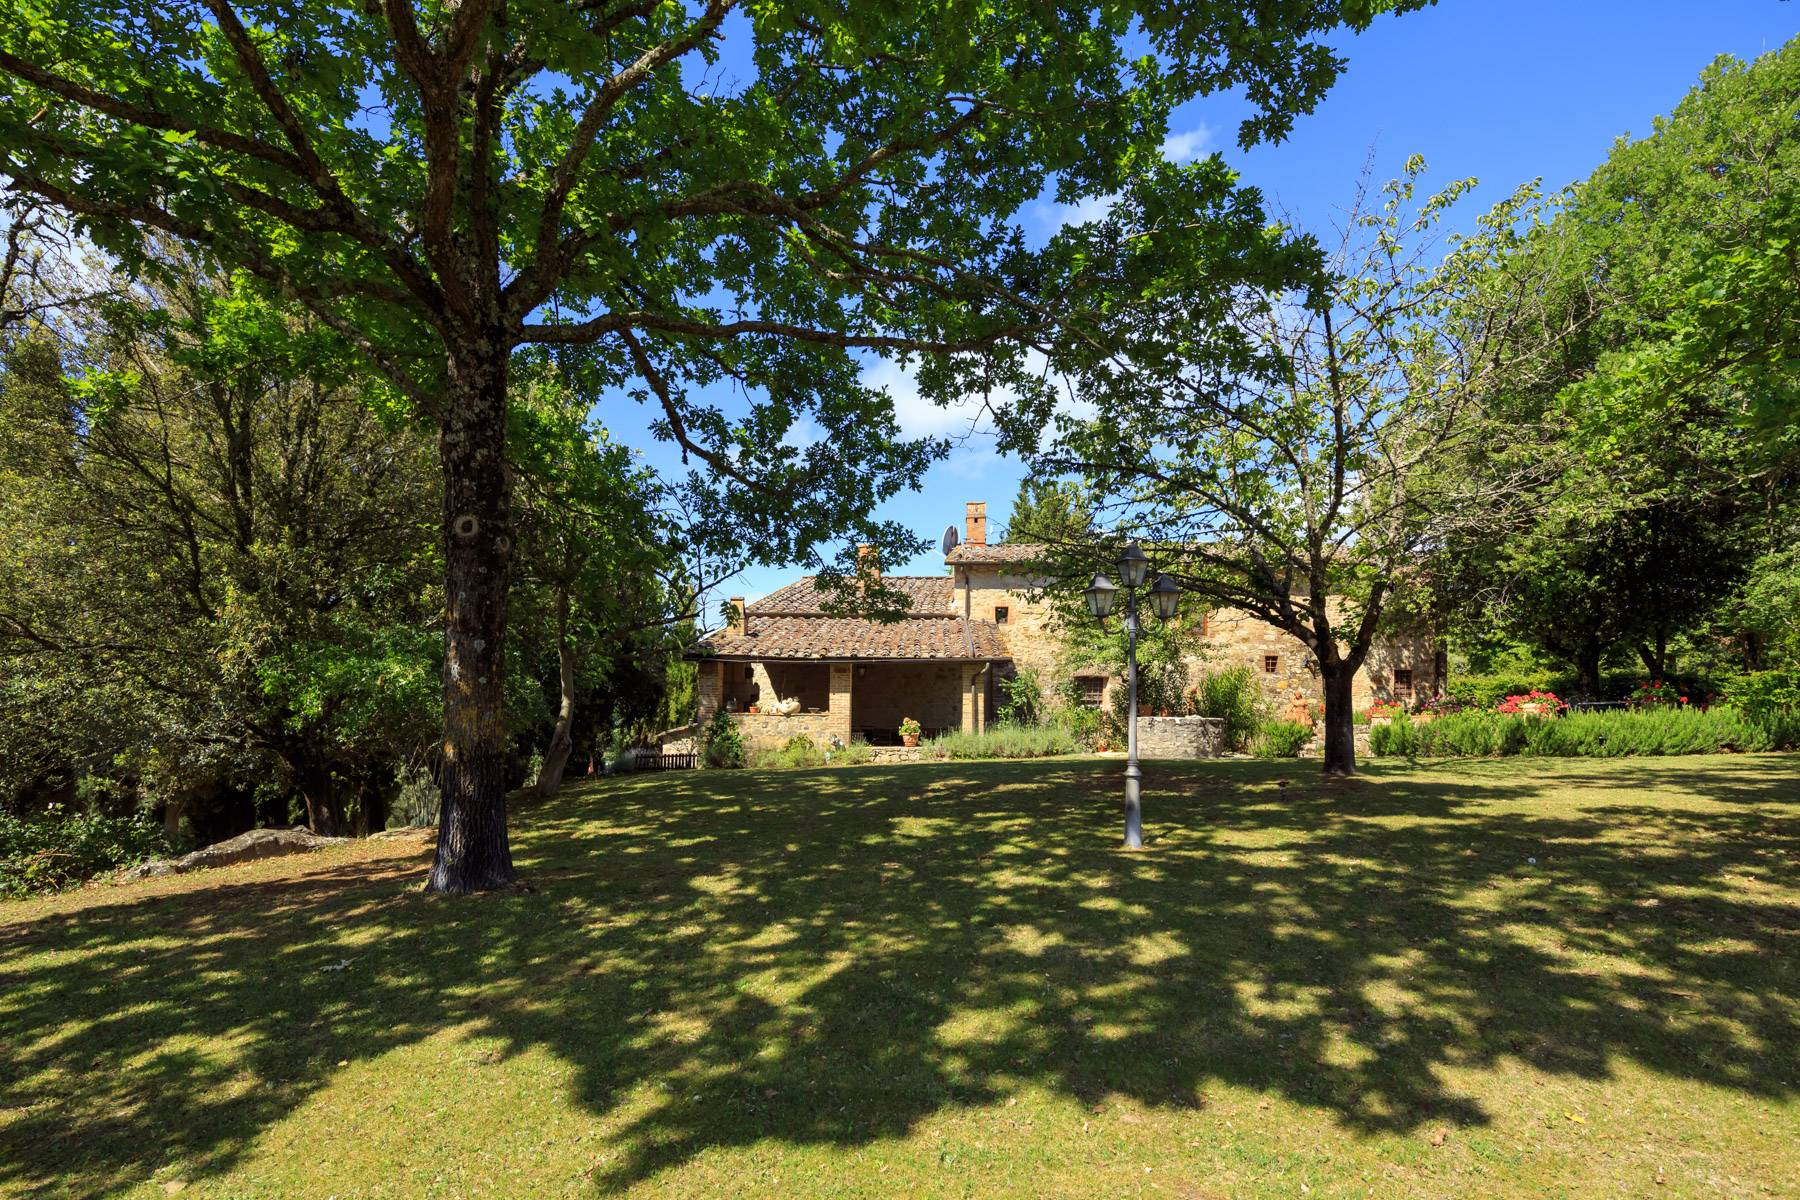 Villa in Vendita a Gaiole In Chianti: 5 locali, 465 mq - Foto 8